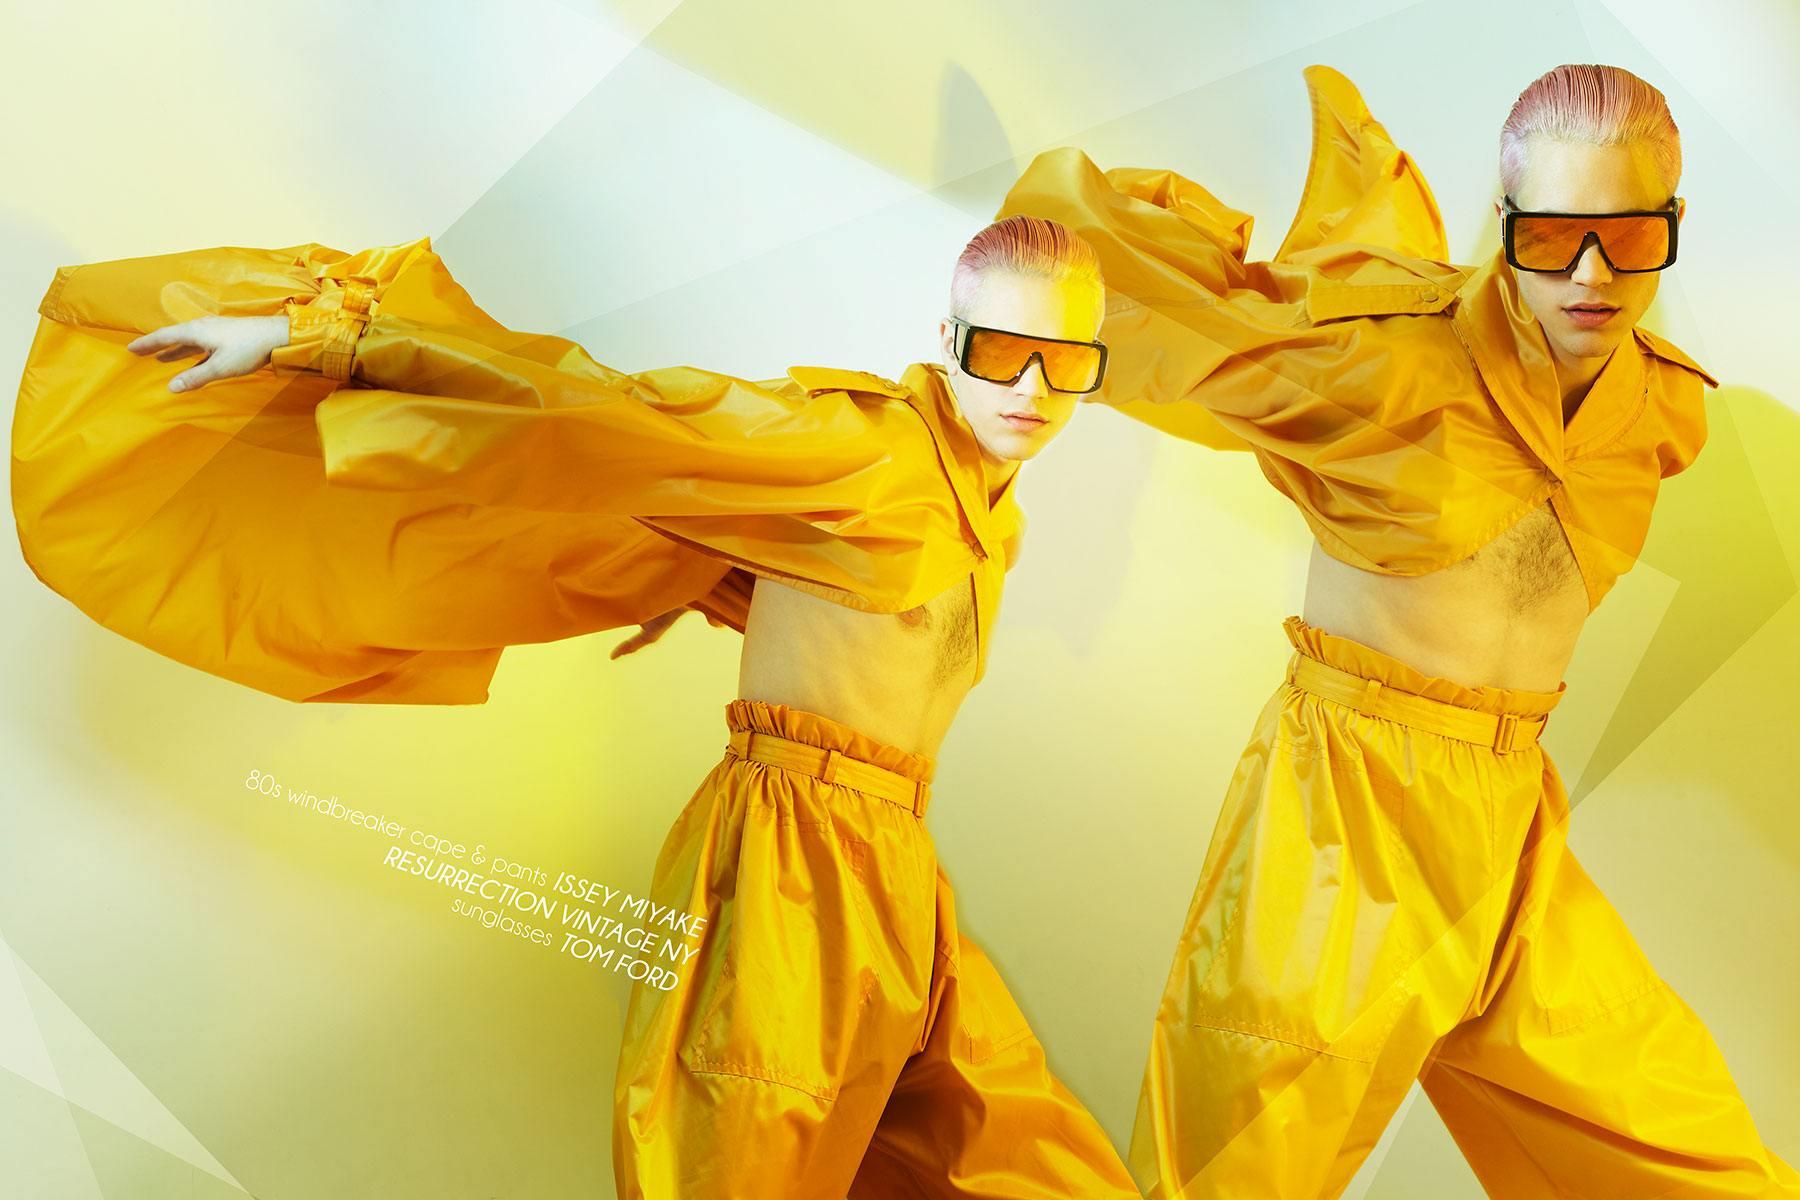 Model Austin Kairis photographed in vintage Issey Miyake by Alexander Thompson for Ponyboy magazine.